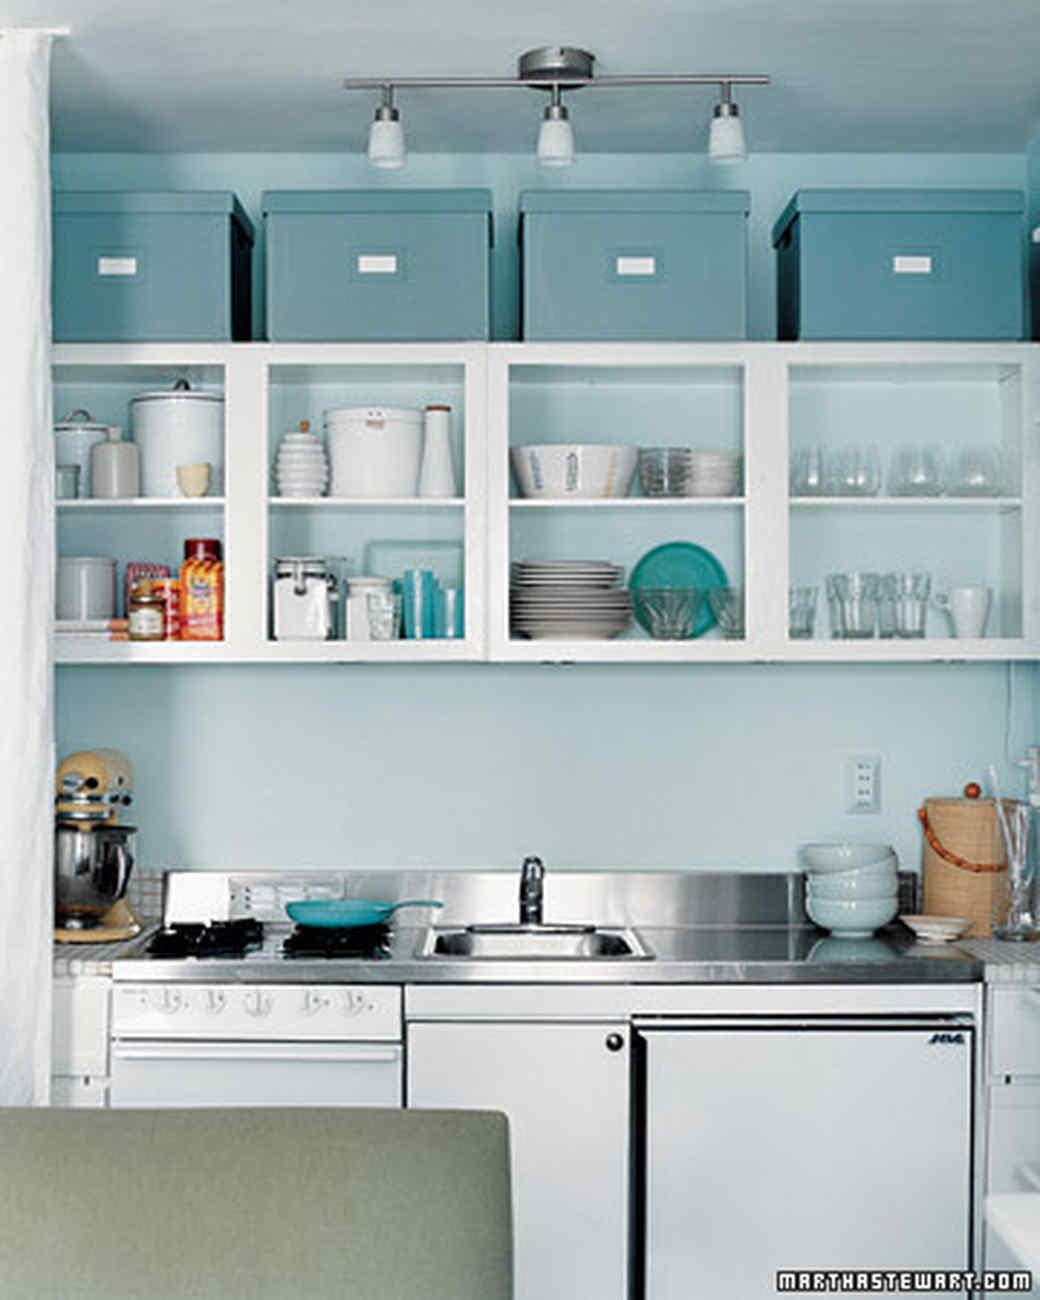 Kitchen Cabinets Organization Storage - Nagpurentrepreneurs